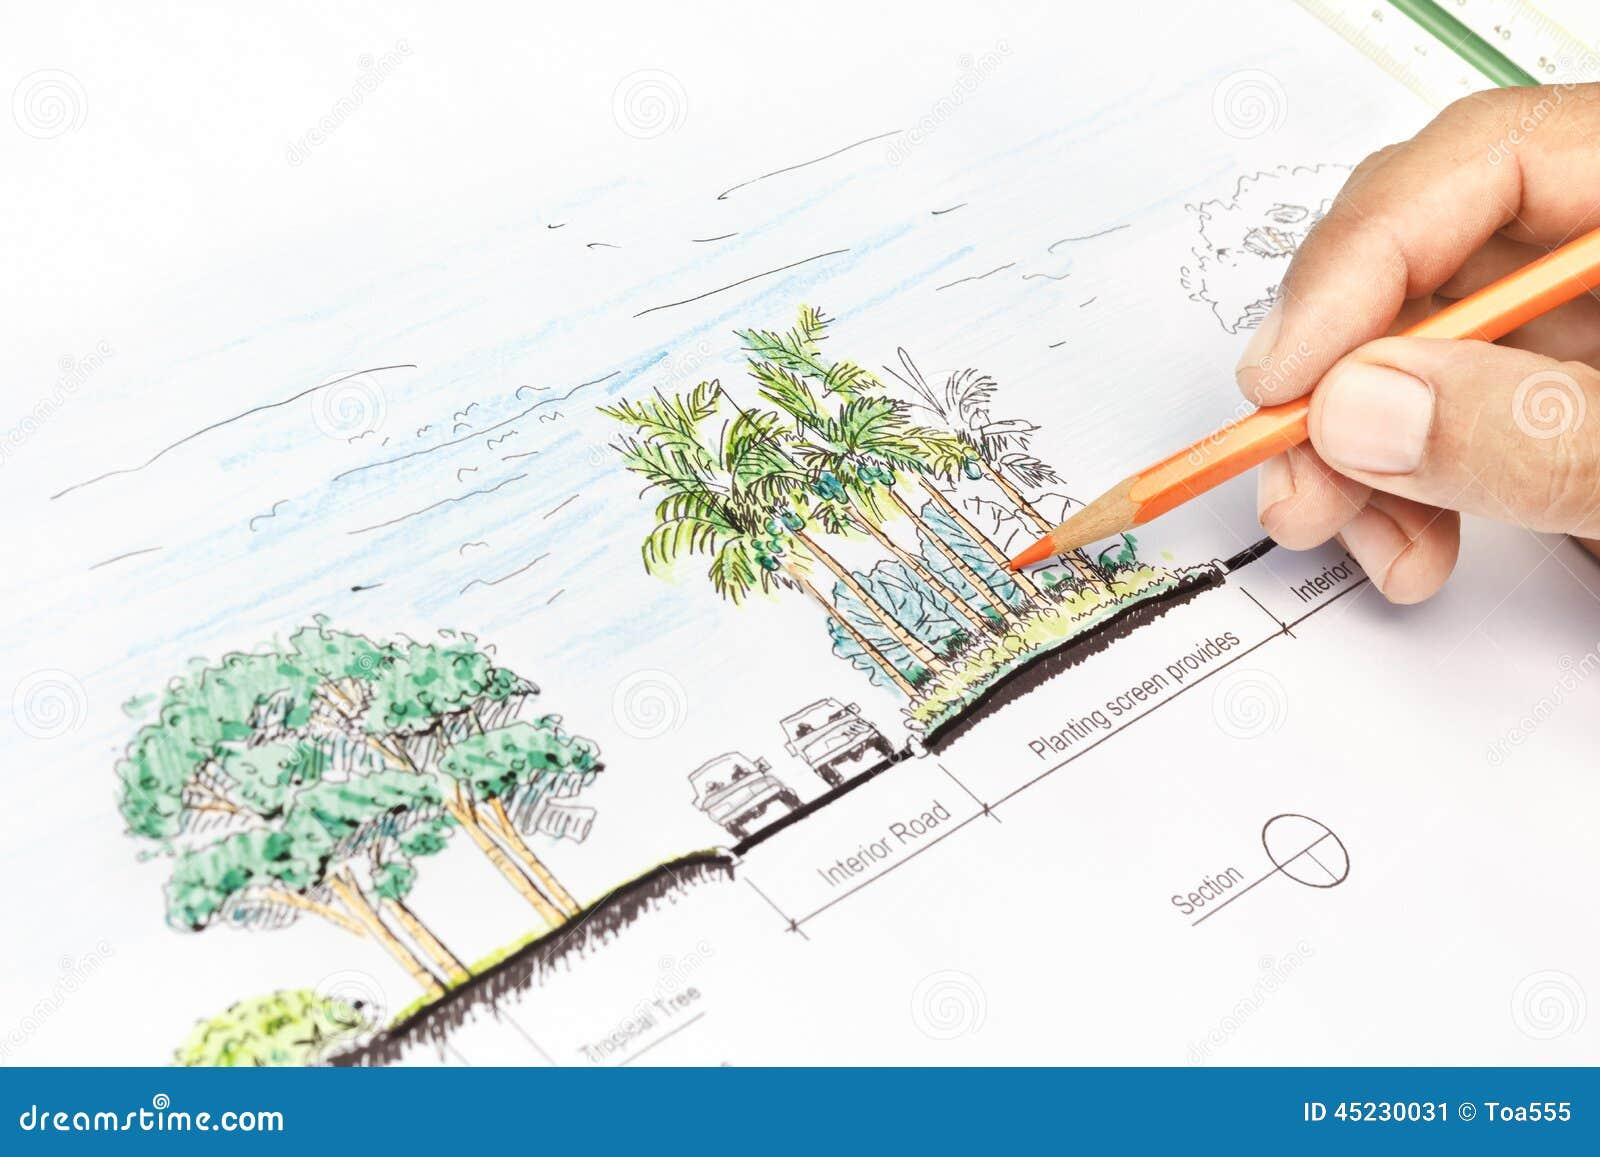 Landscape architect design section plan stock image